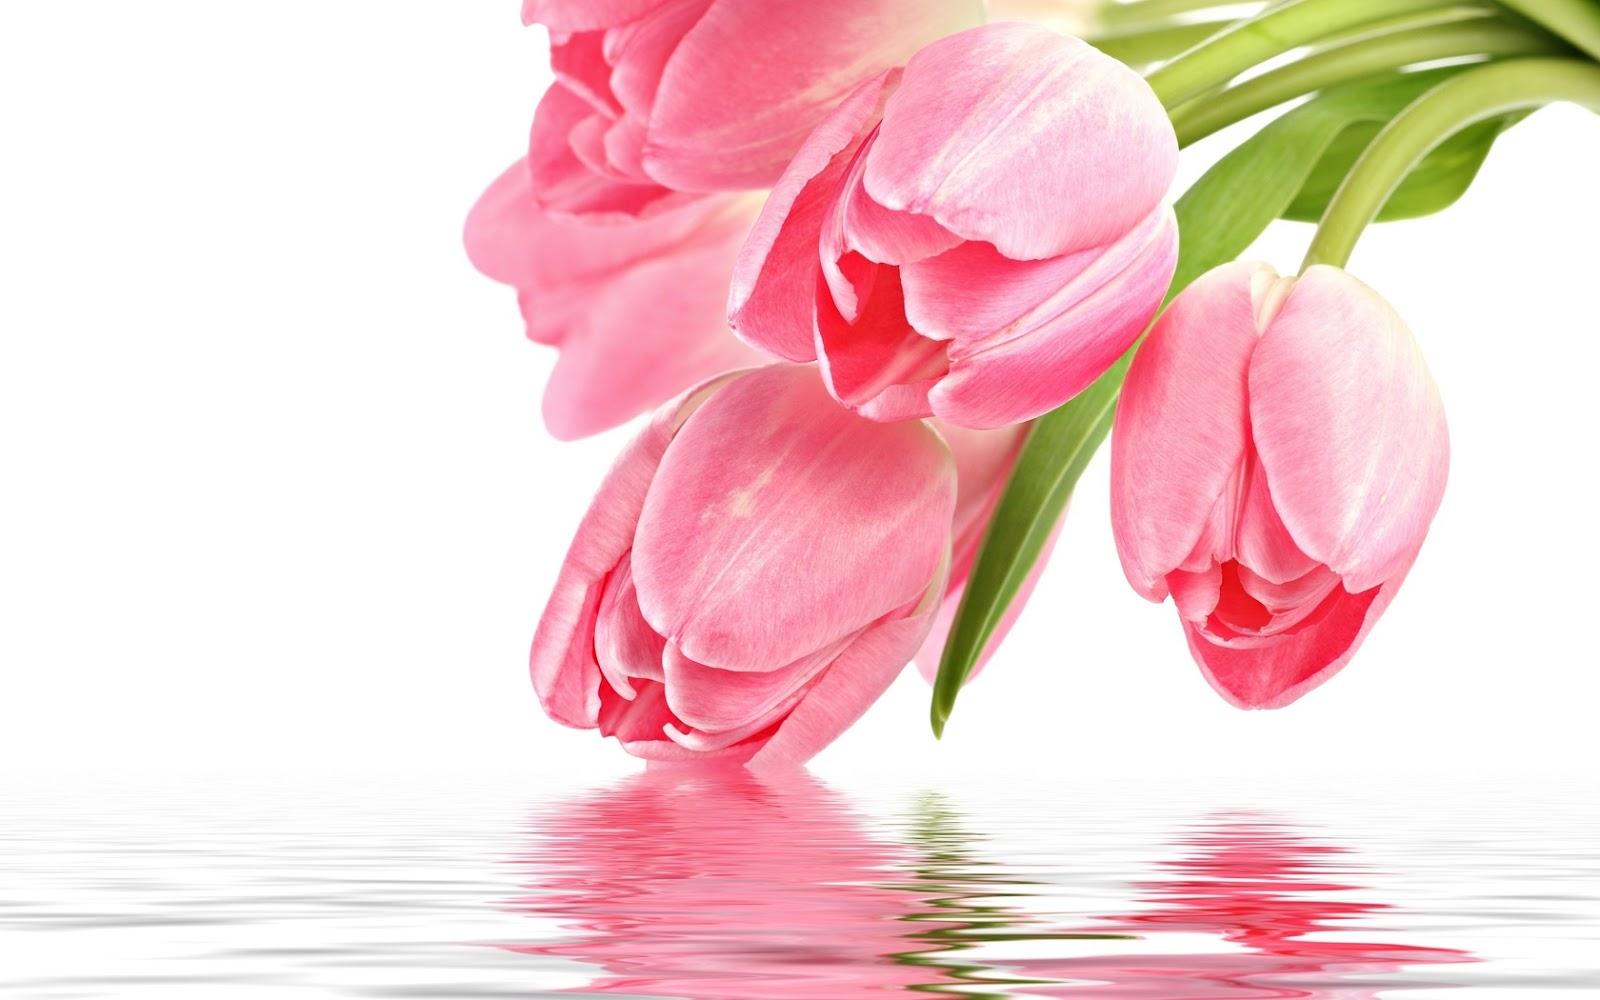 imagenes de flores tulipanes: